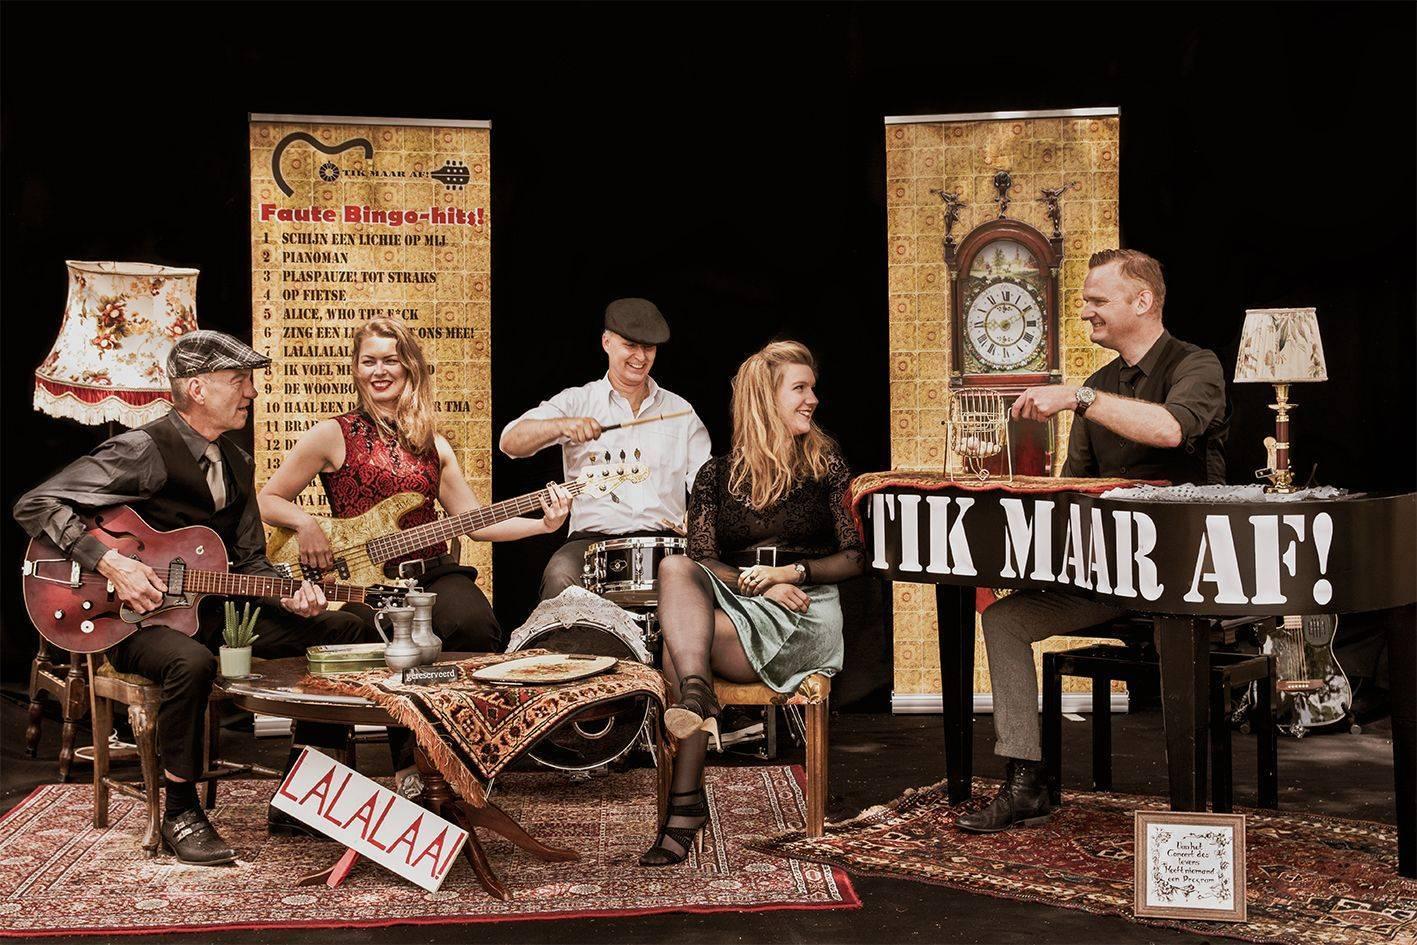 Coverband TikMaarAf